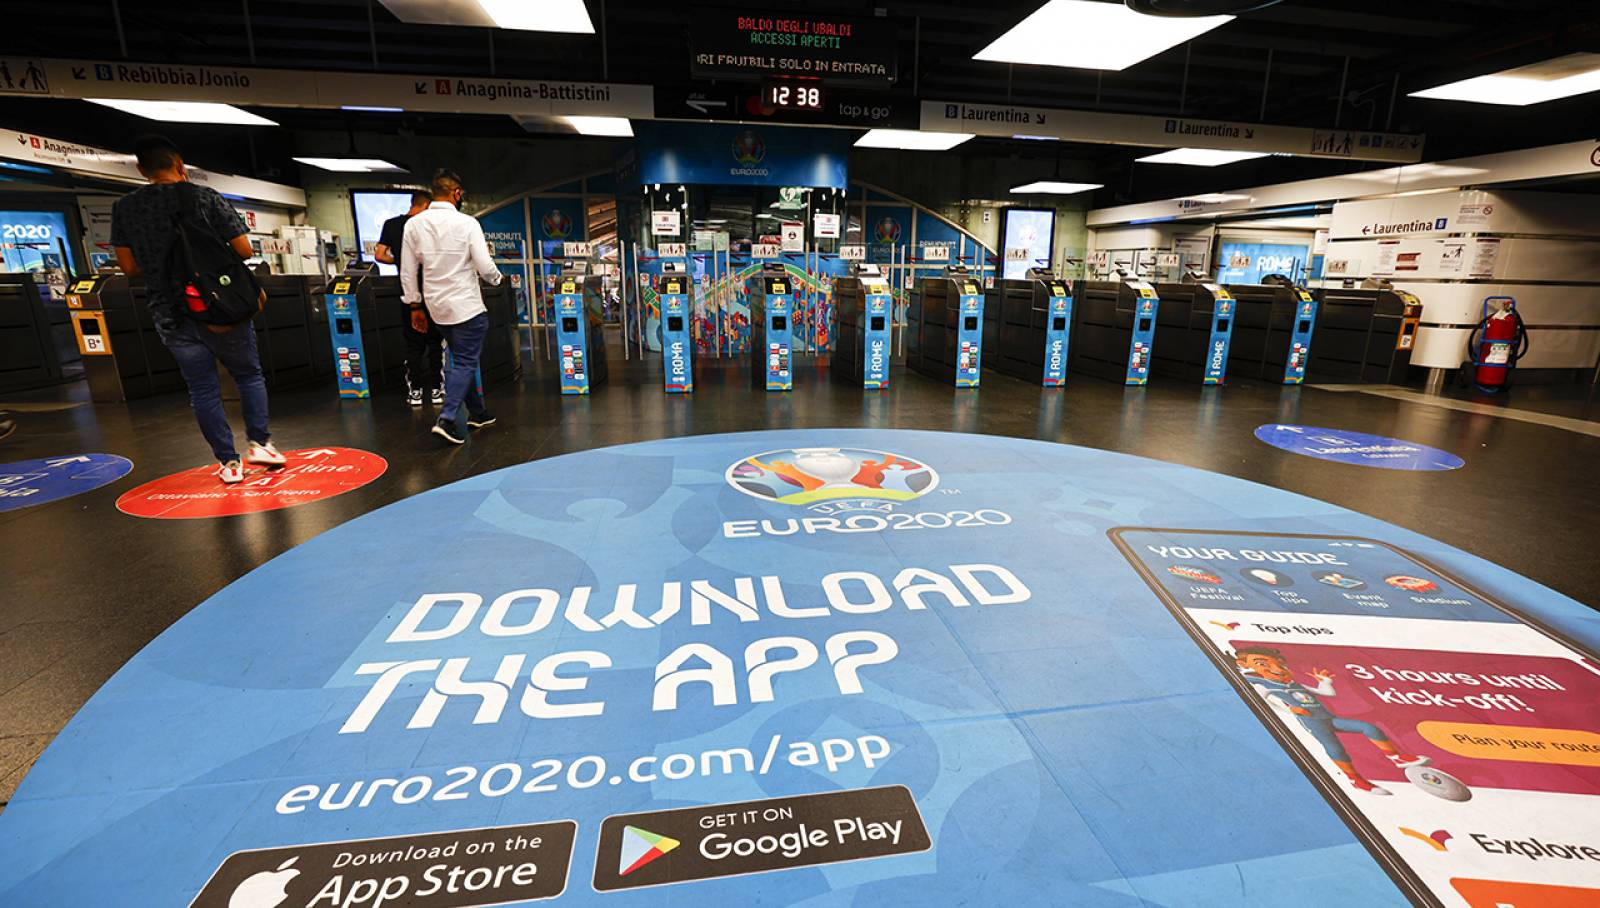 Pubblicità in metropolitana a Roma Termini Station Domination per UEFA 2020 IGPDecaux